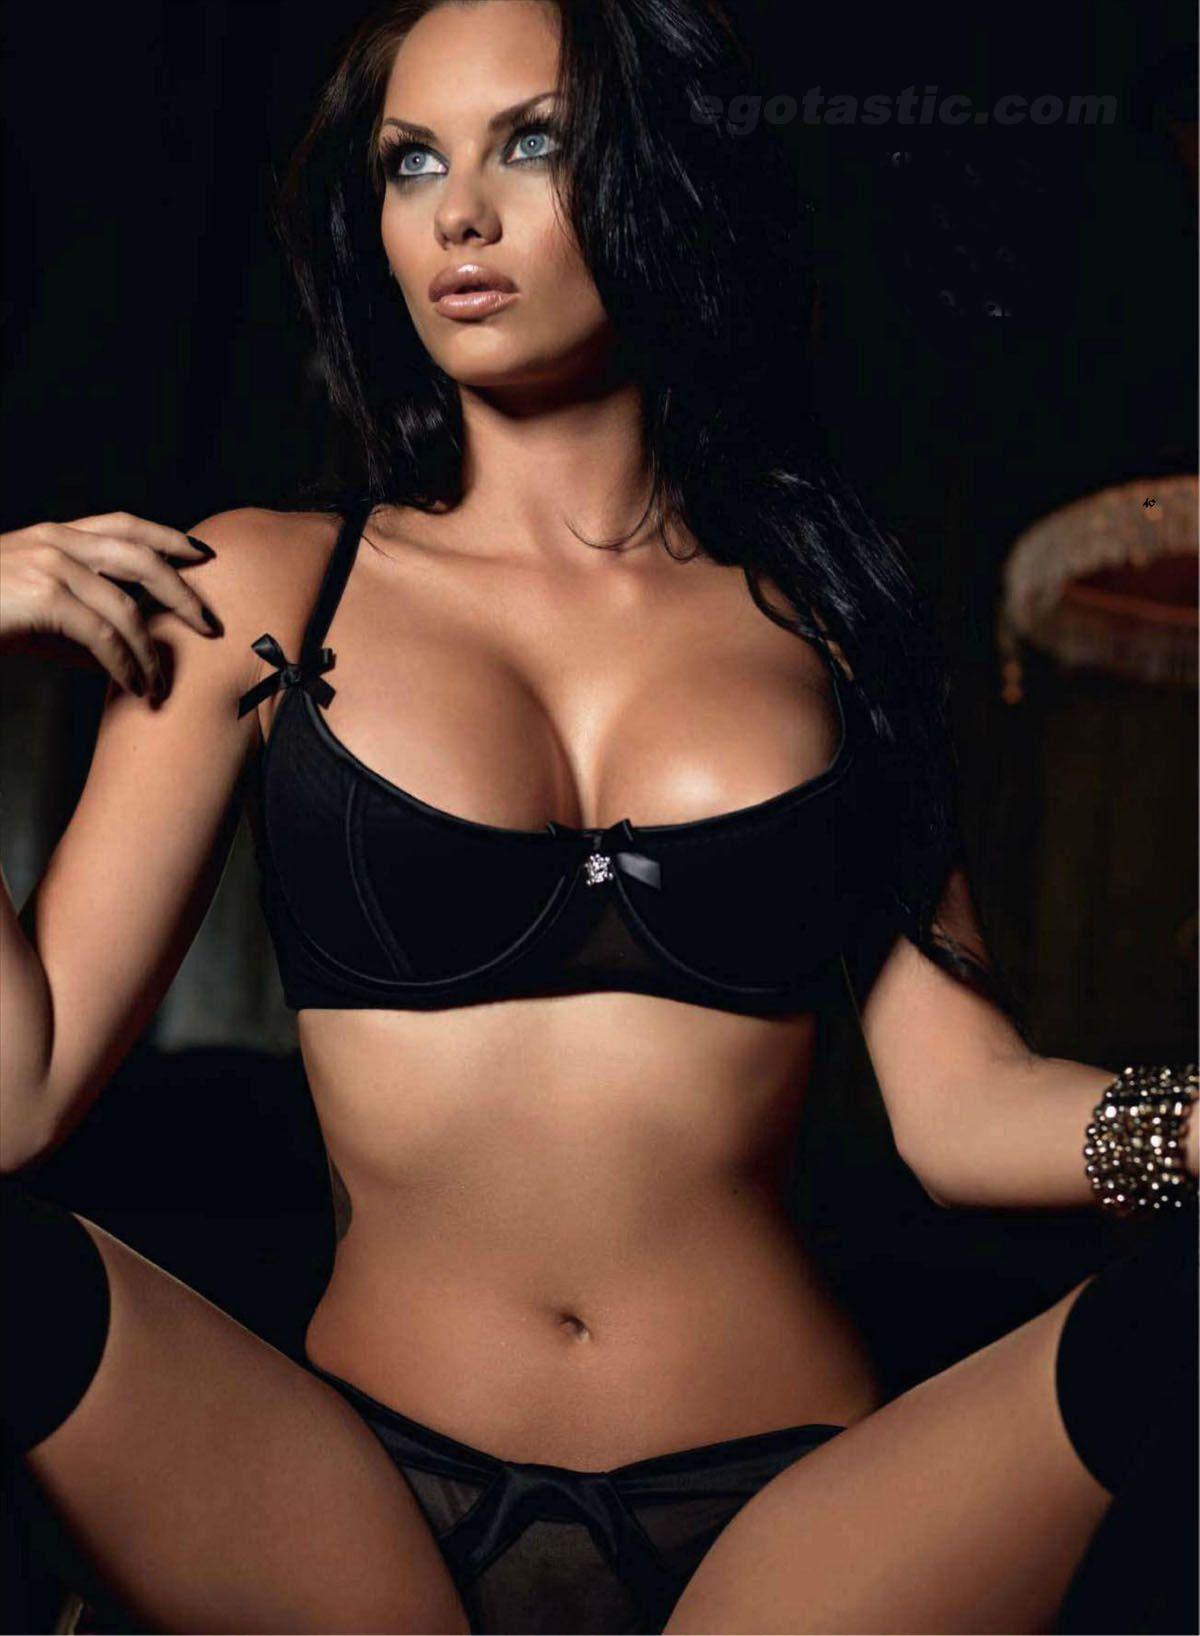 hot sale online 4617e eba37 Pin auf Hot Babes